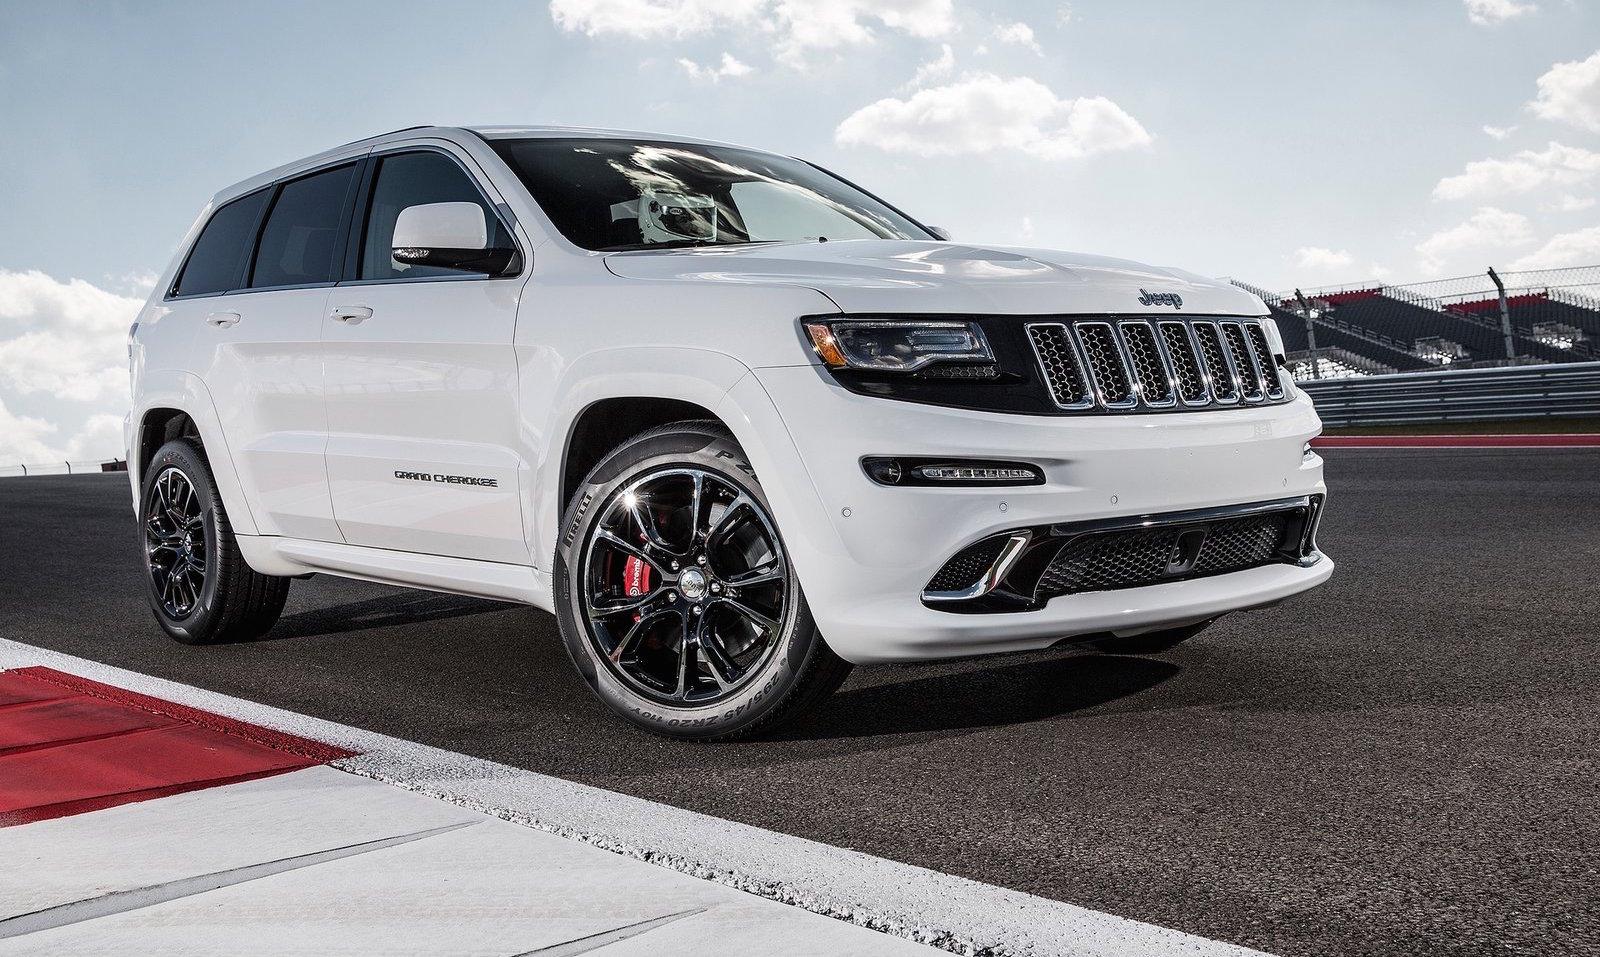 Jeep Grand Cherokee Srt10 >> Srt10 Jeep Best Car Reviews 2019 2020 By Thepressclubmanchester